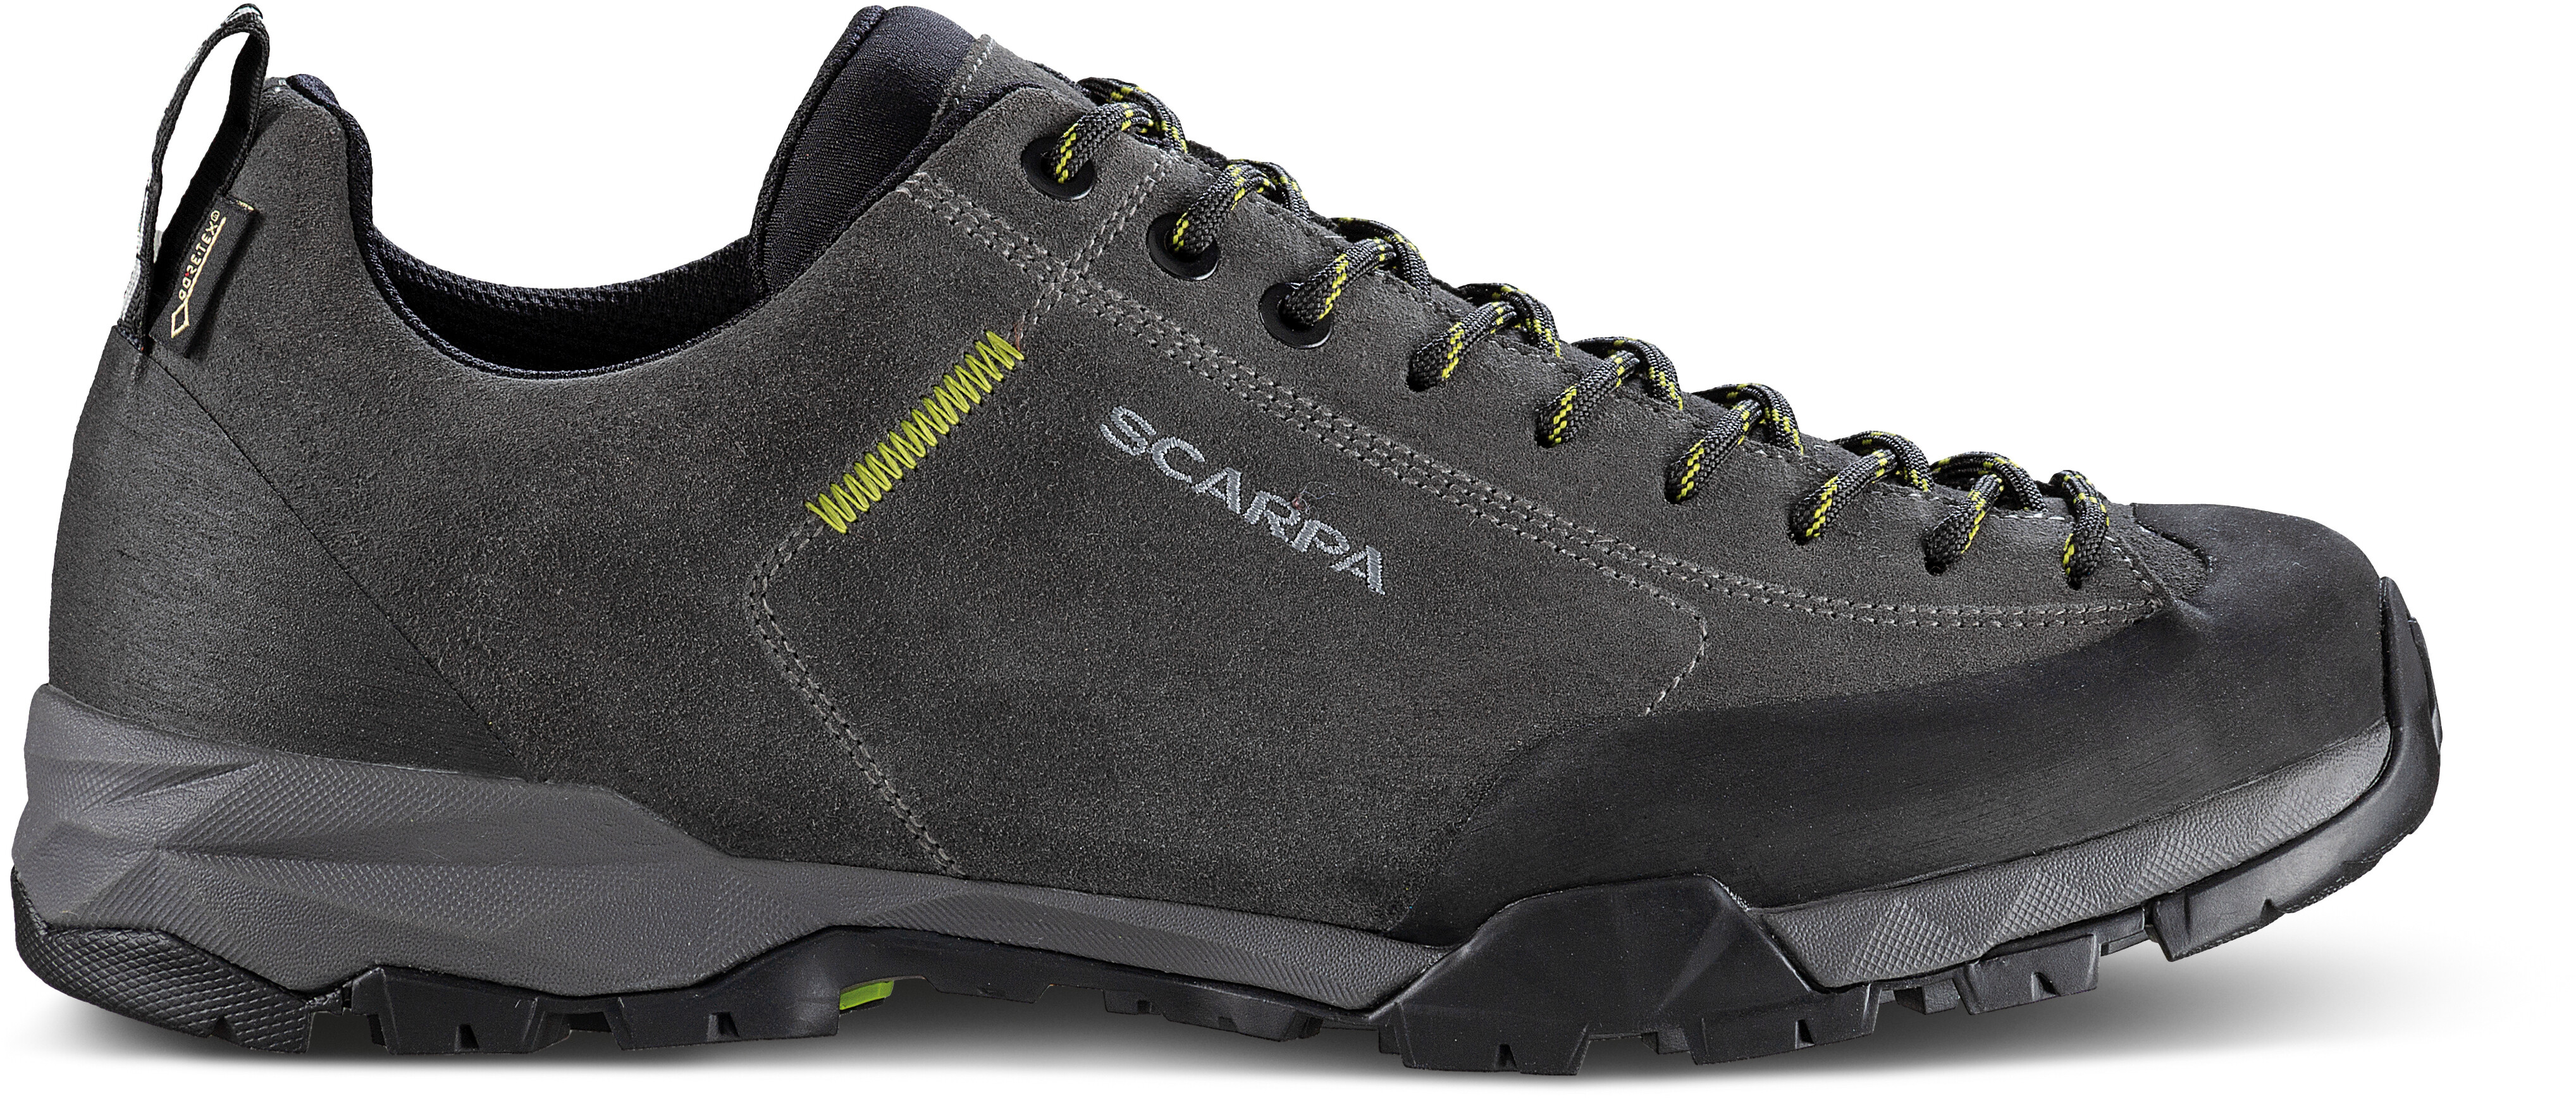 9e51f1cc8b4 Scarpa Mojito Trail GTX Shoes Men shark